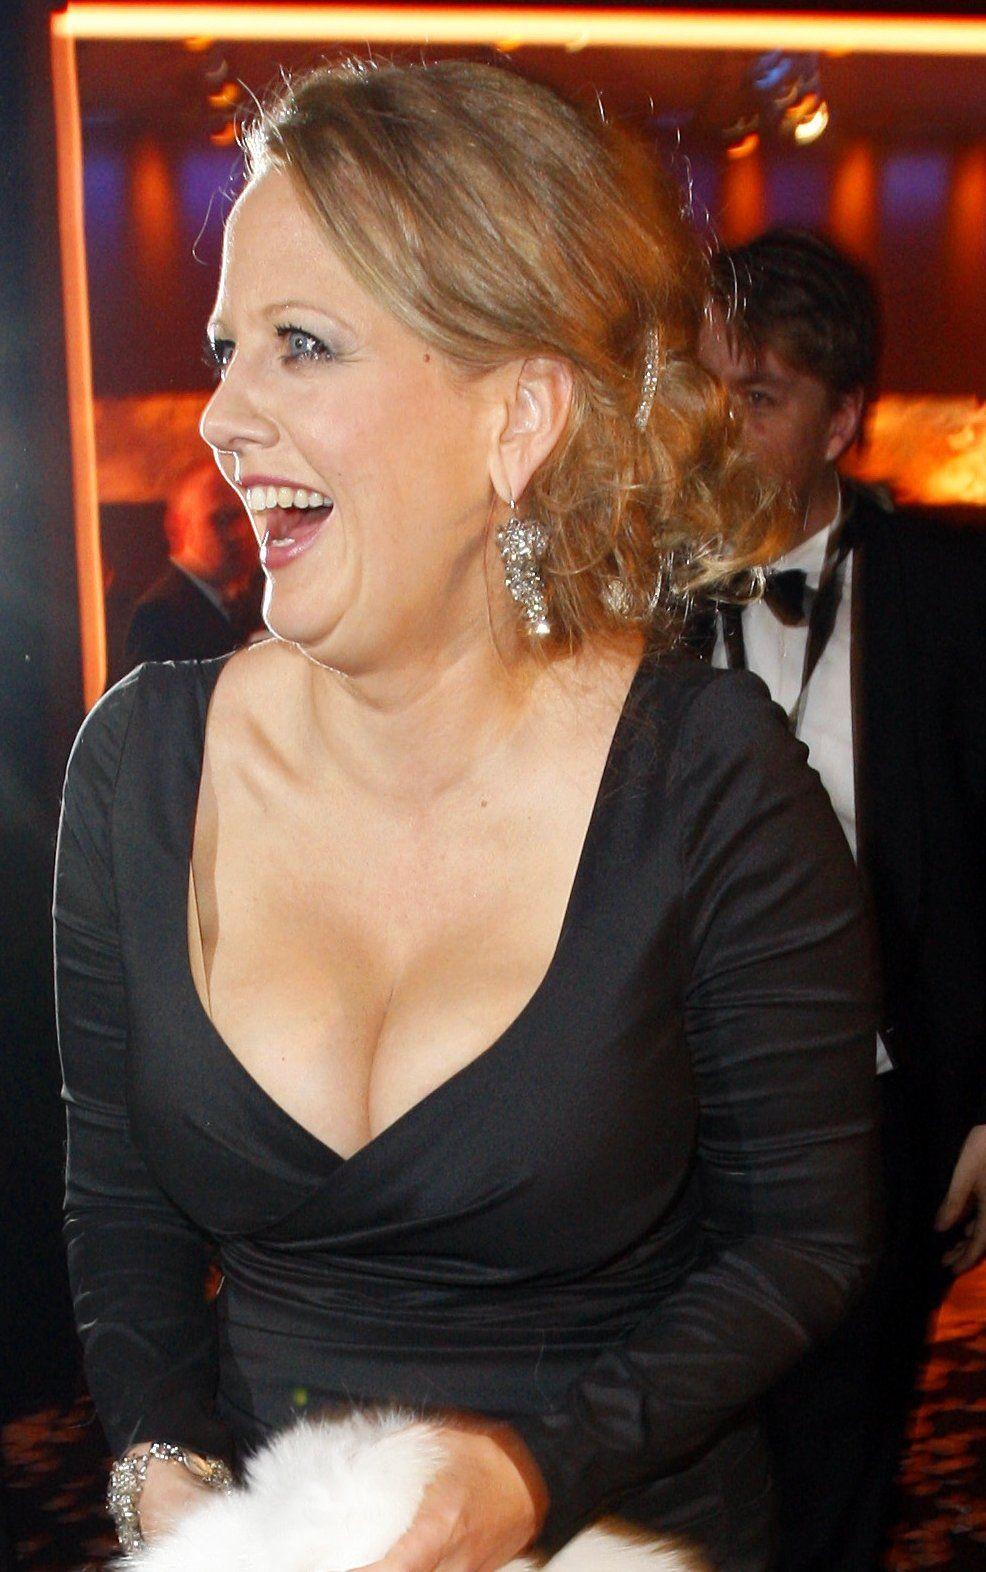 Andrea Sawatzki Sexy 0__barbara-sch_neberger_0   celebs, german women